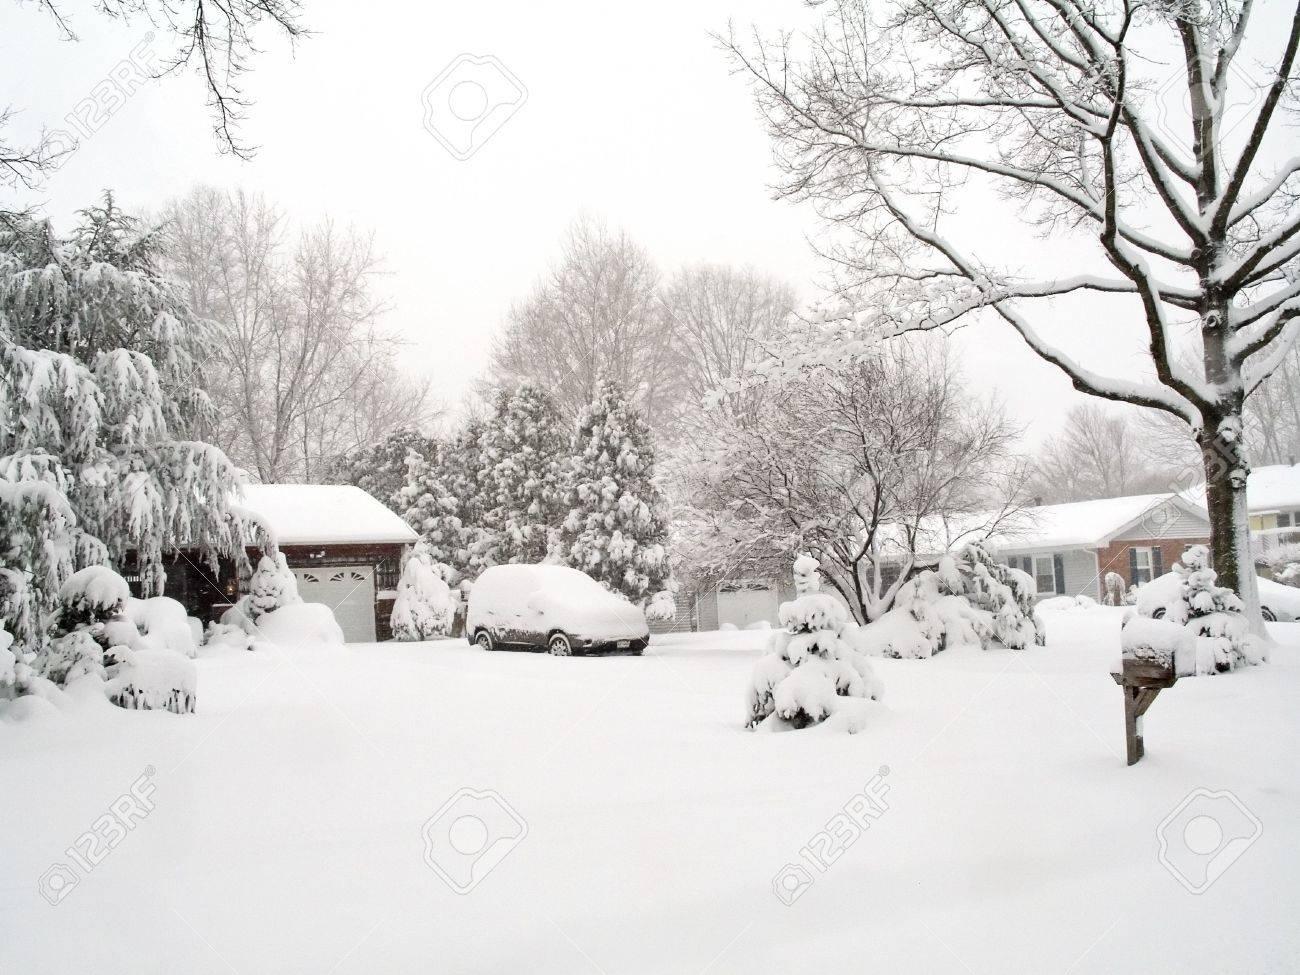 Snowy Neighborhood by Sous-Sol on DeviantArt